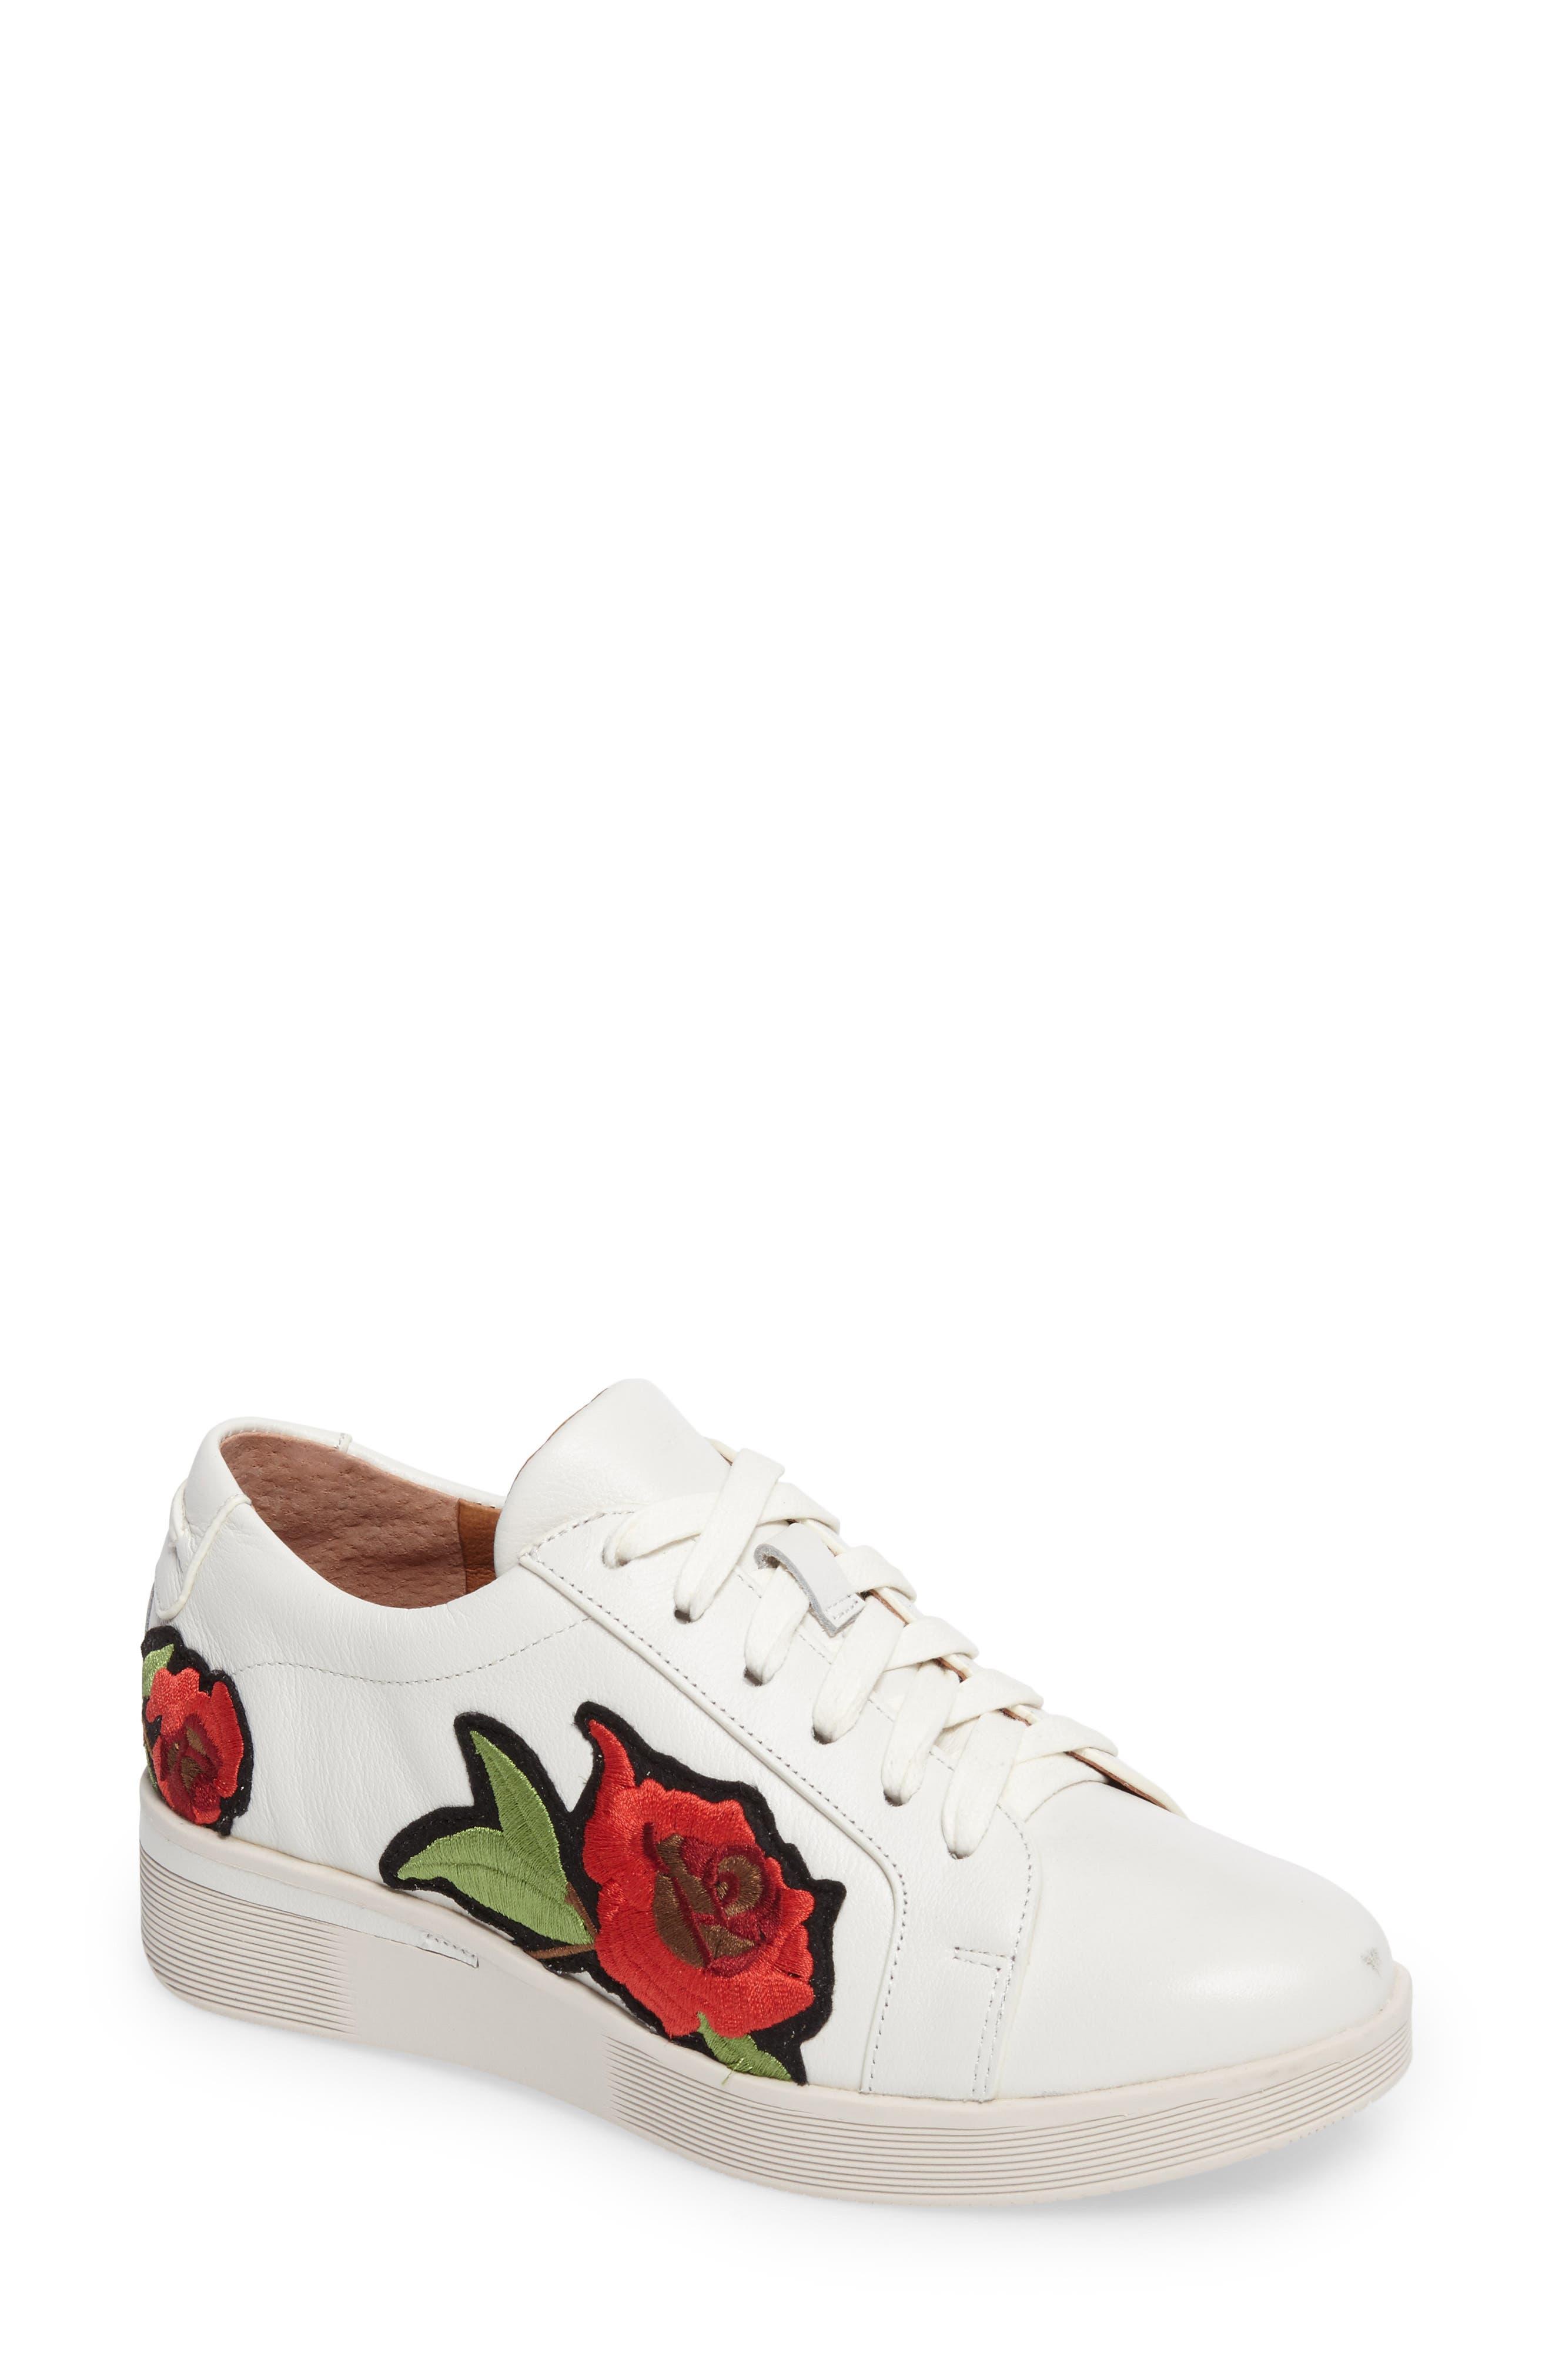 Gentle Soles Haddie Rose Sneaker,                             Main thumbnail 1, color,                             110